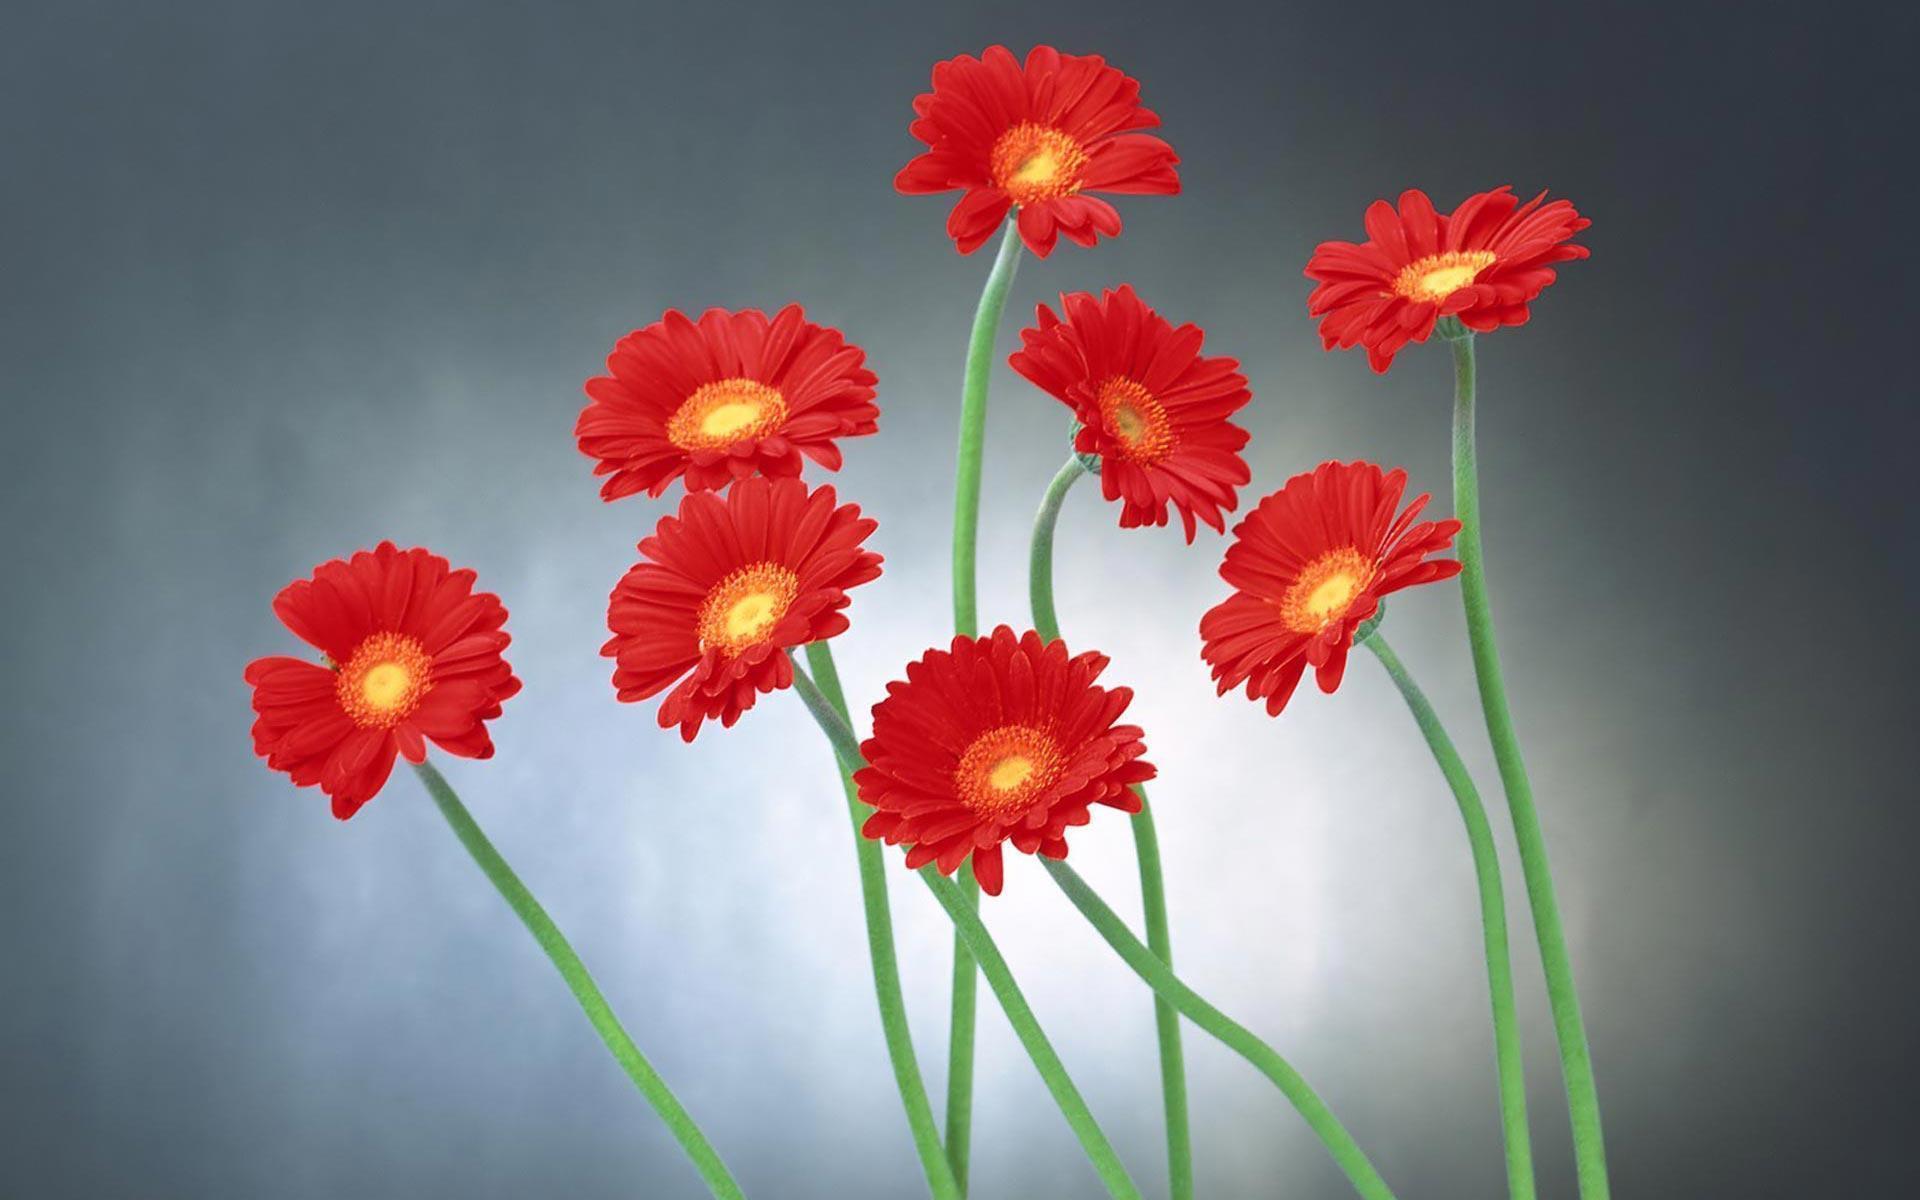 HD Flower Wallpapers 1920x1200